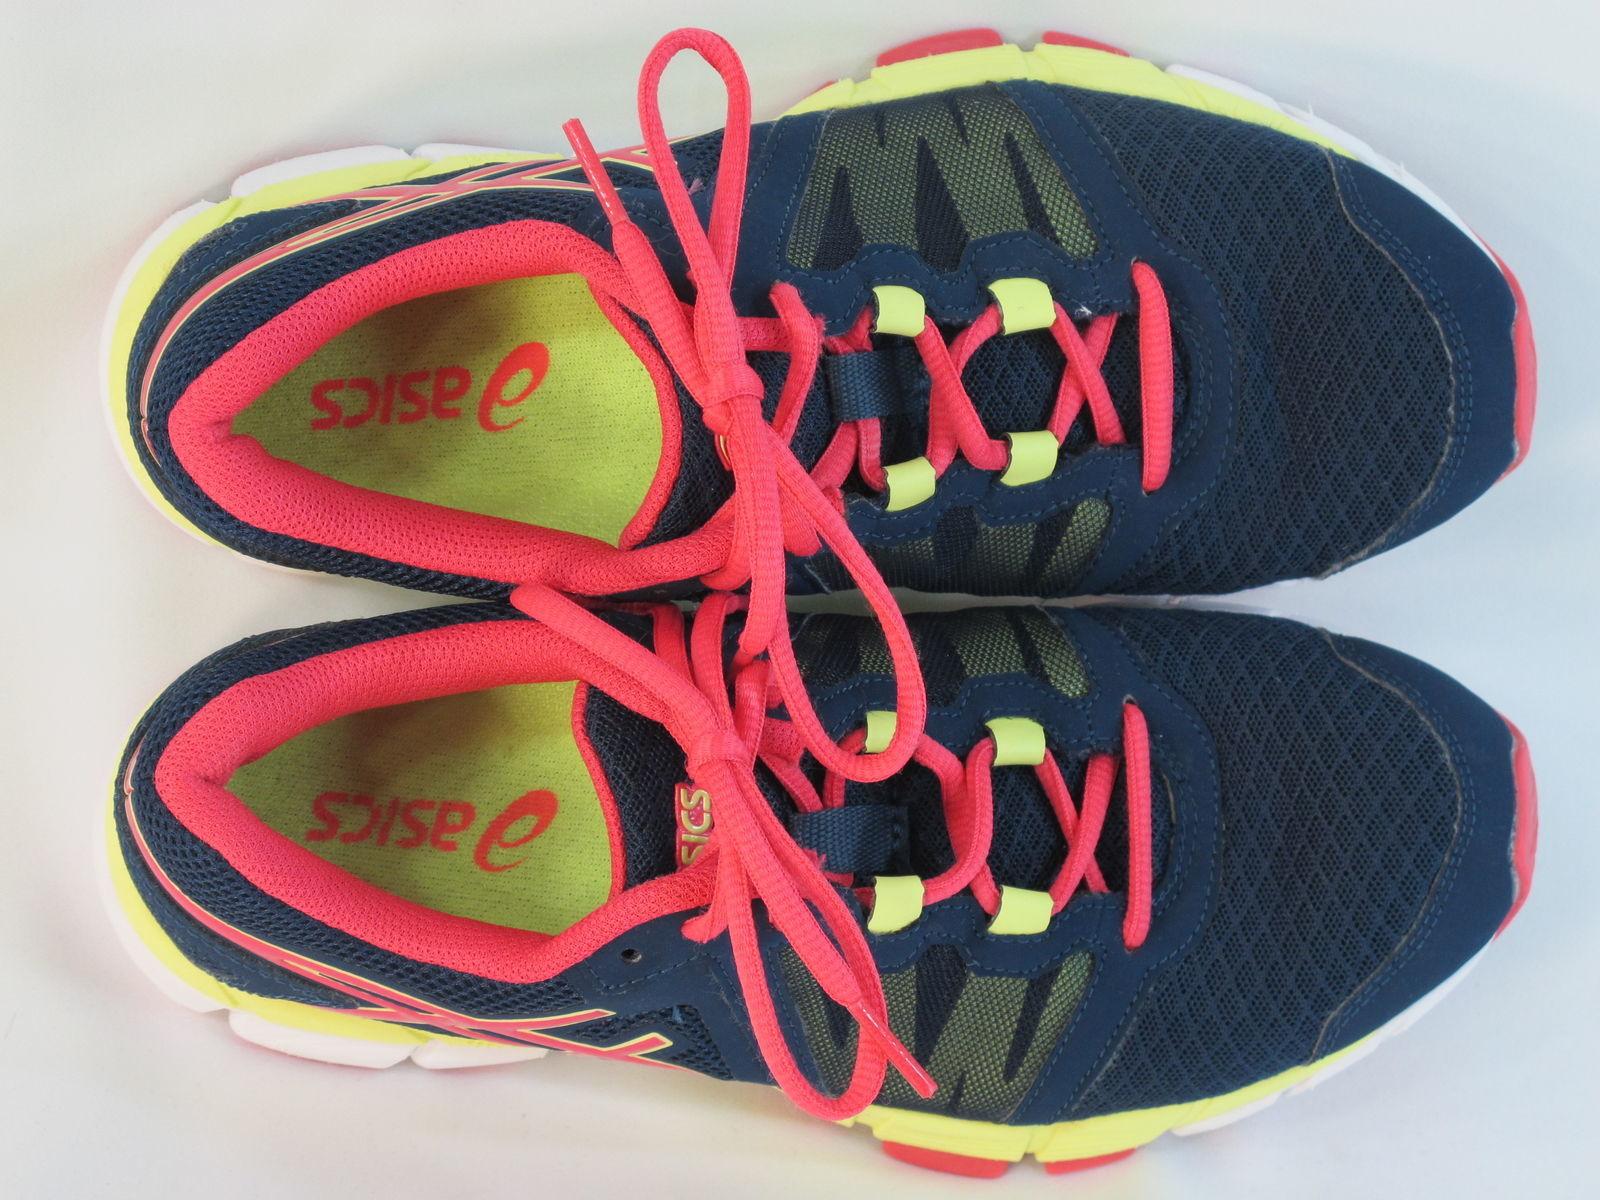 ASICS Gel Craze TR Cross Training Shoes Women's Size 7.5 US Near Mint Condition